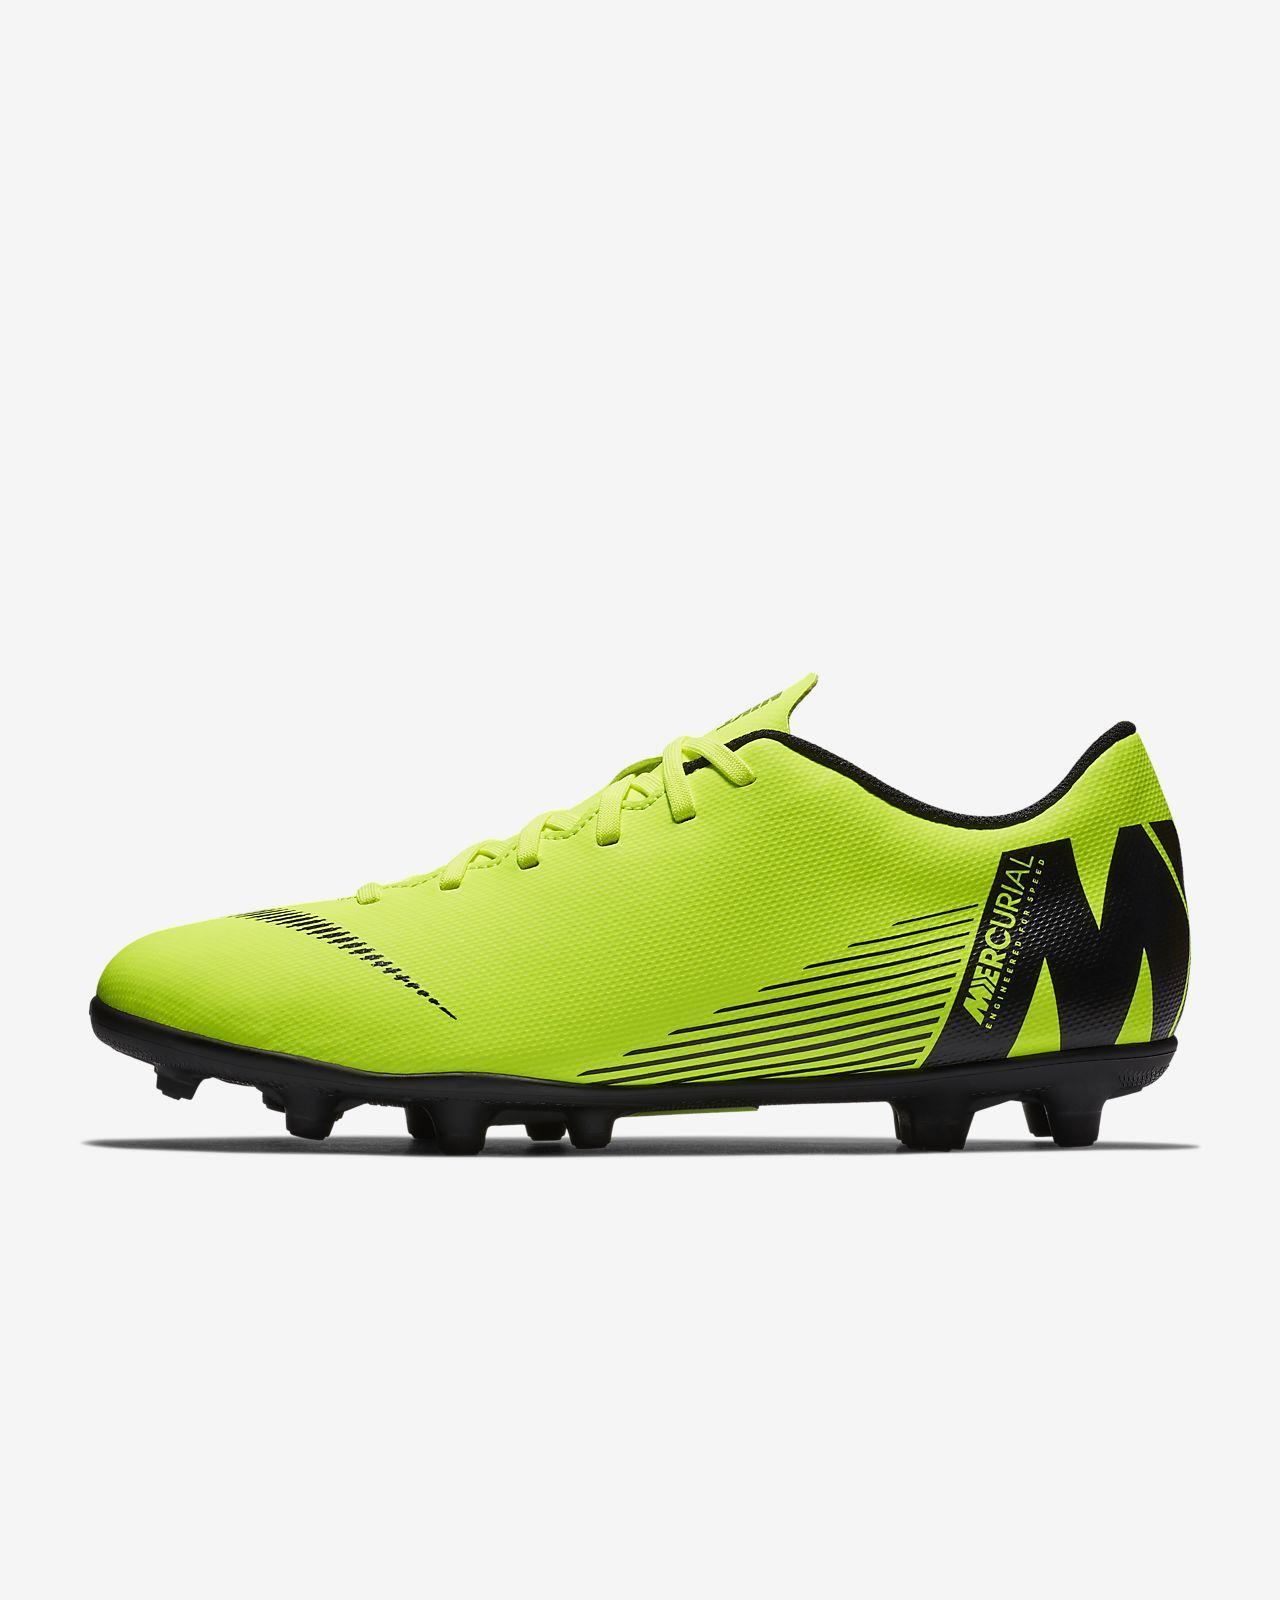 new product 15eeb 9969e Multi-Ground Football Boot. Nike Mercurial Vapor XII Club MG